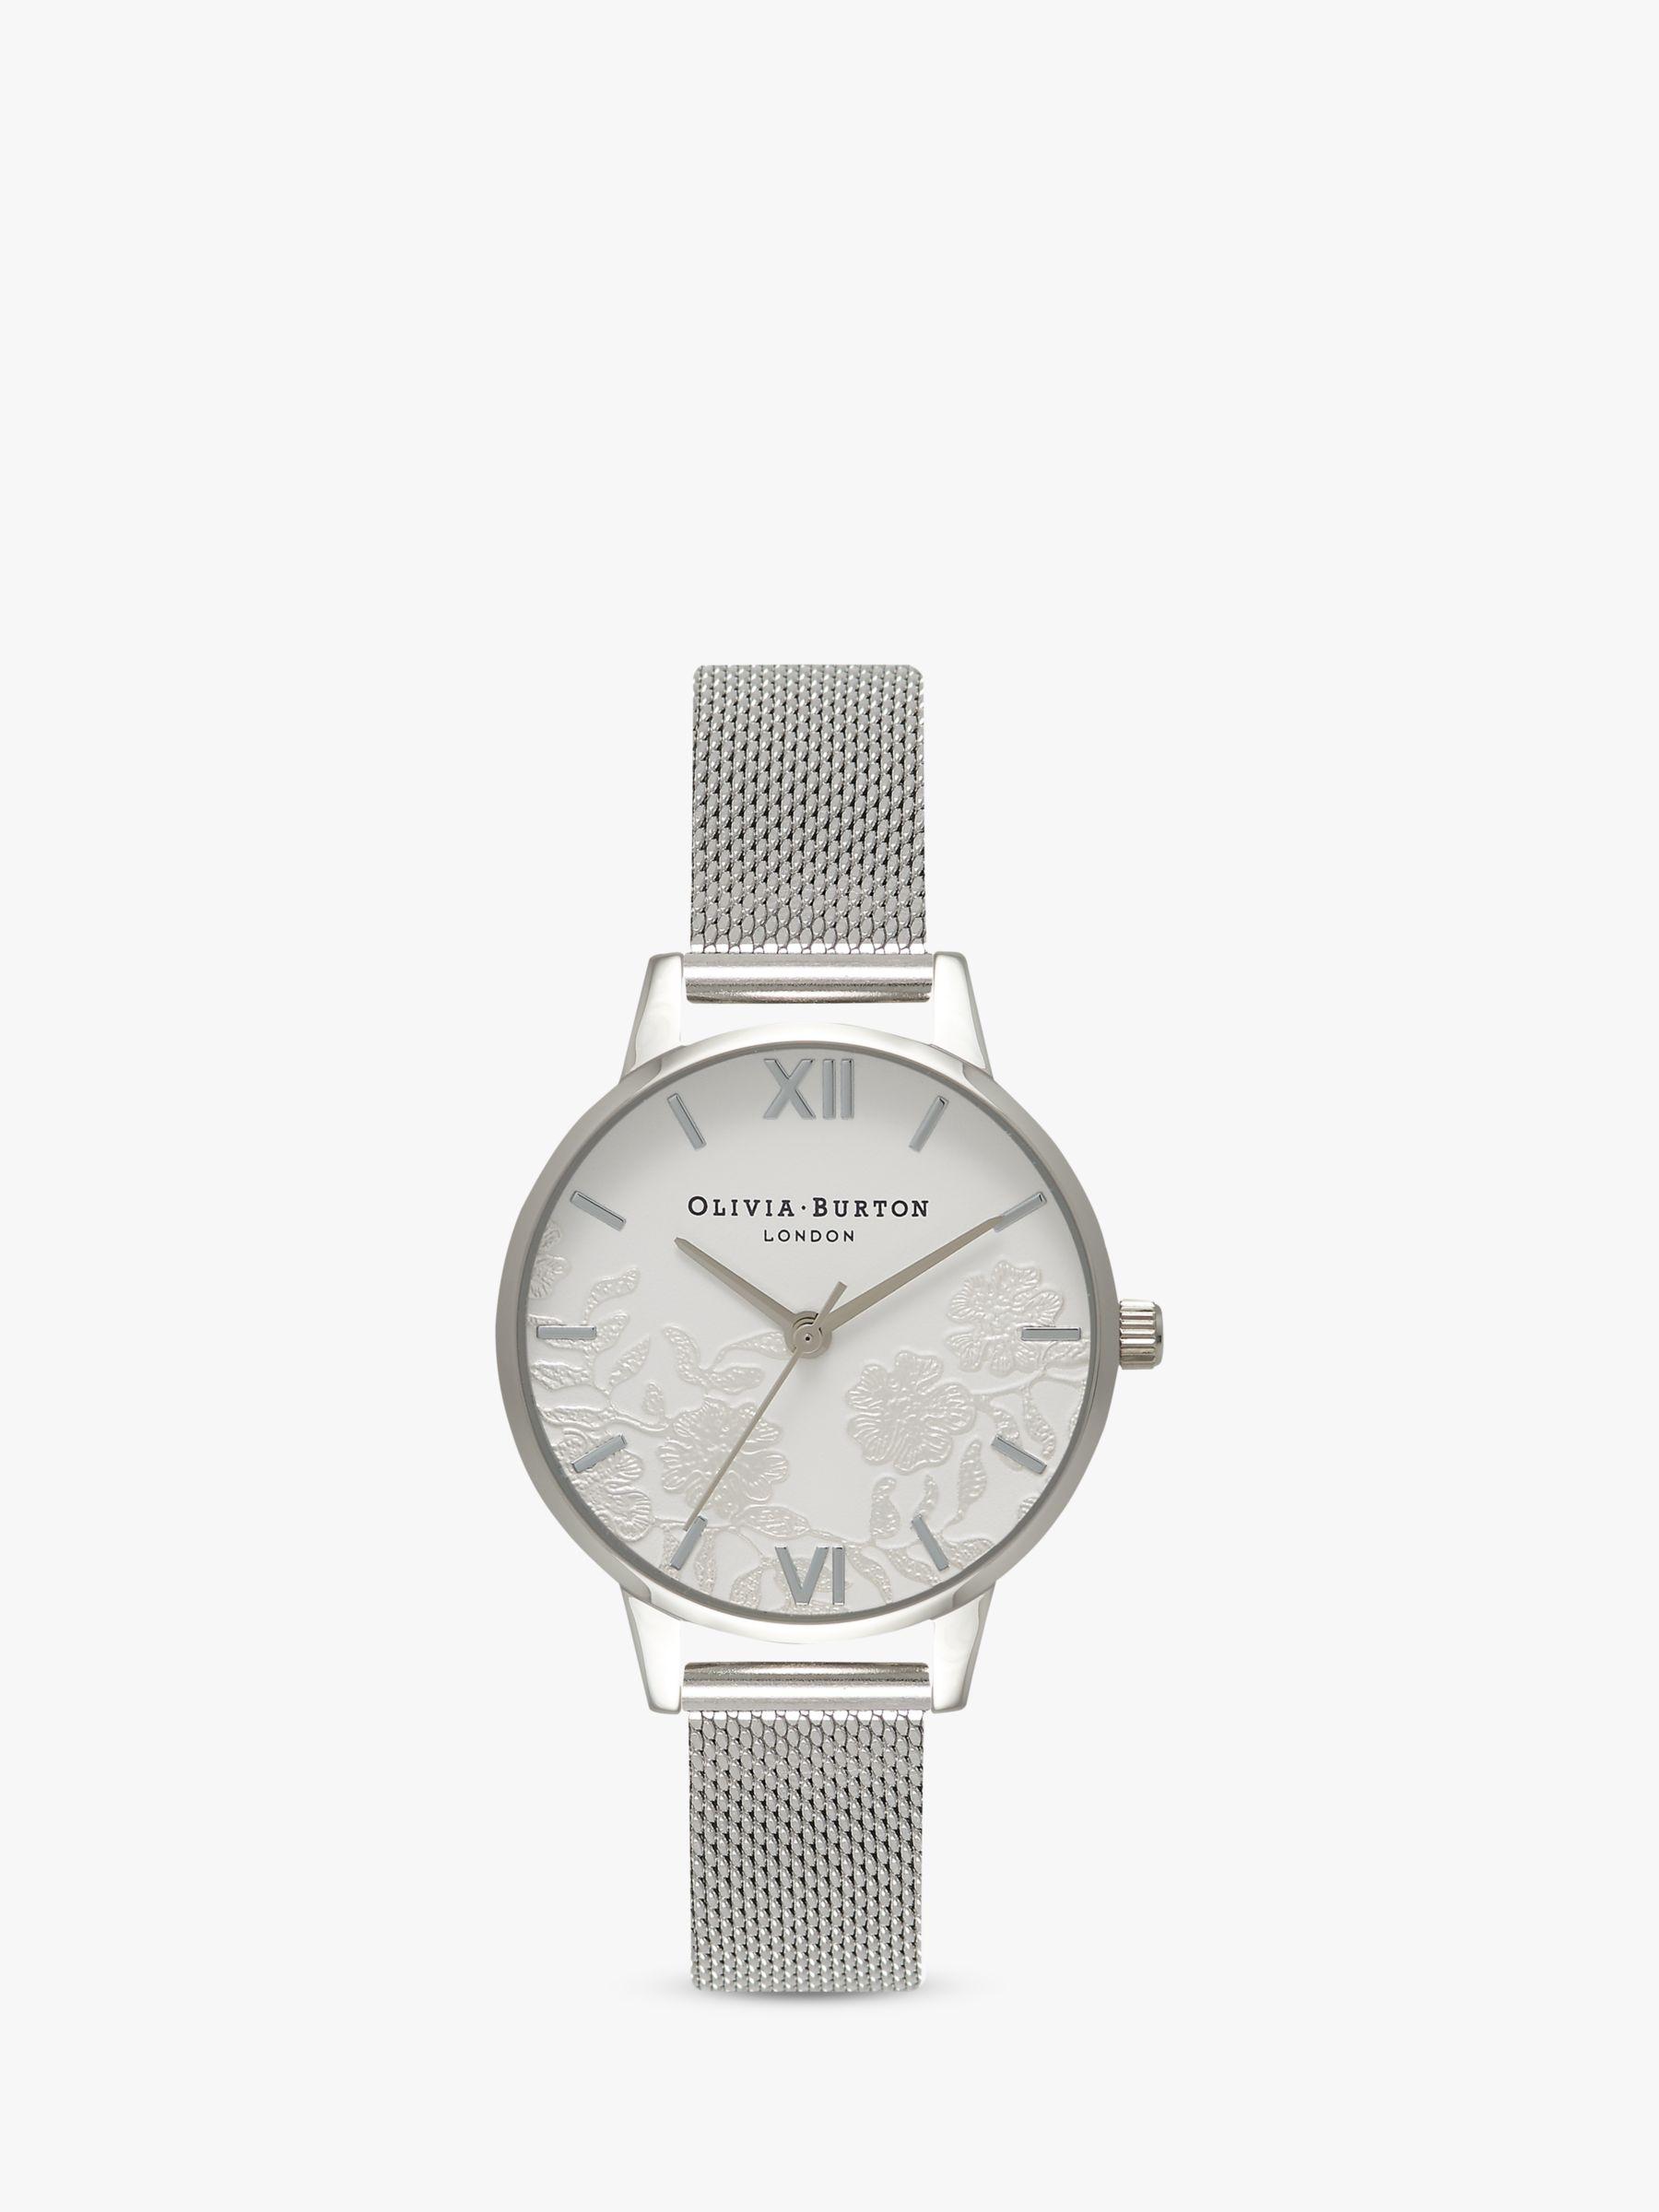 Olivia Burton Olivia Burton OB16MV54 Women's Lace Detail Bracelet Strap Watch, Silver/White